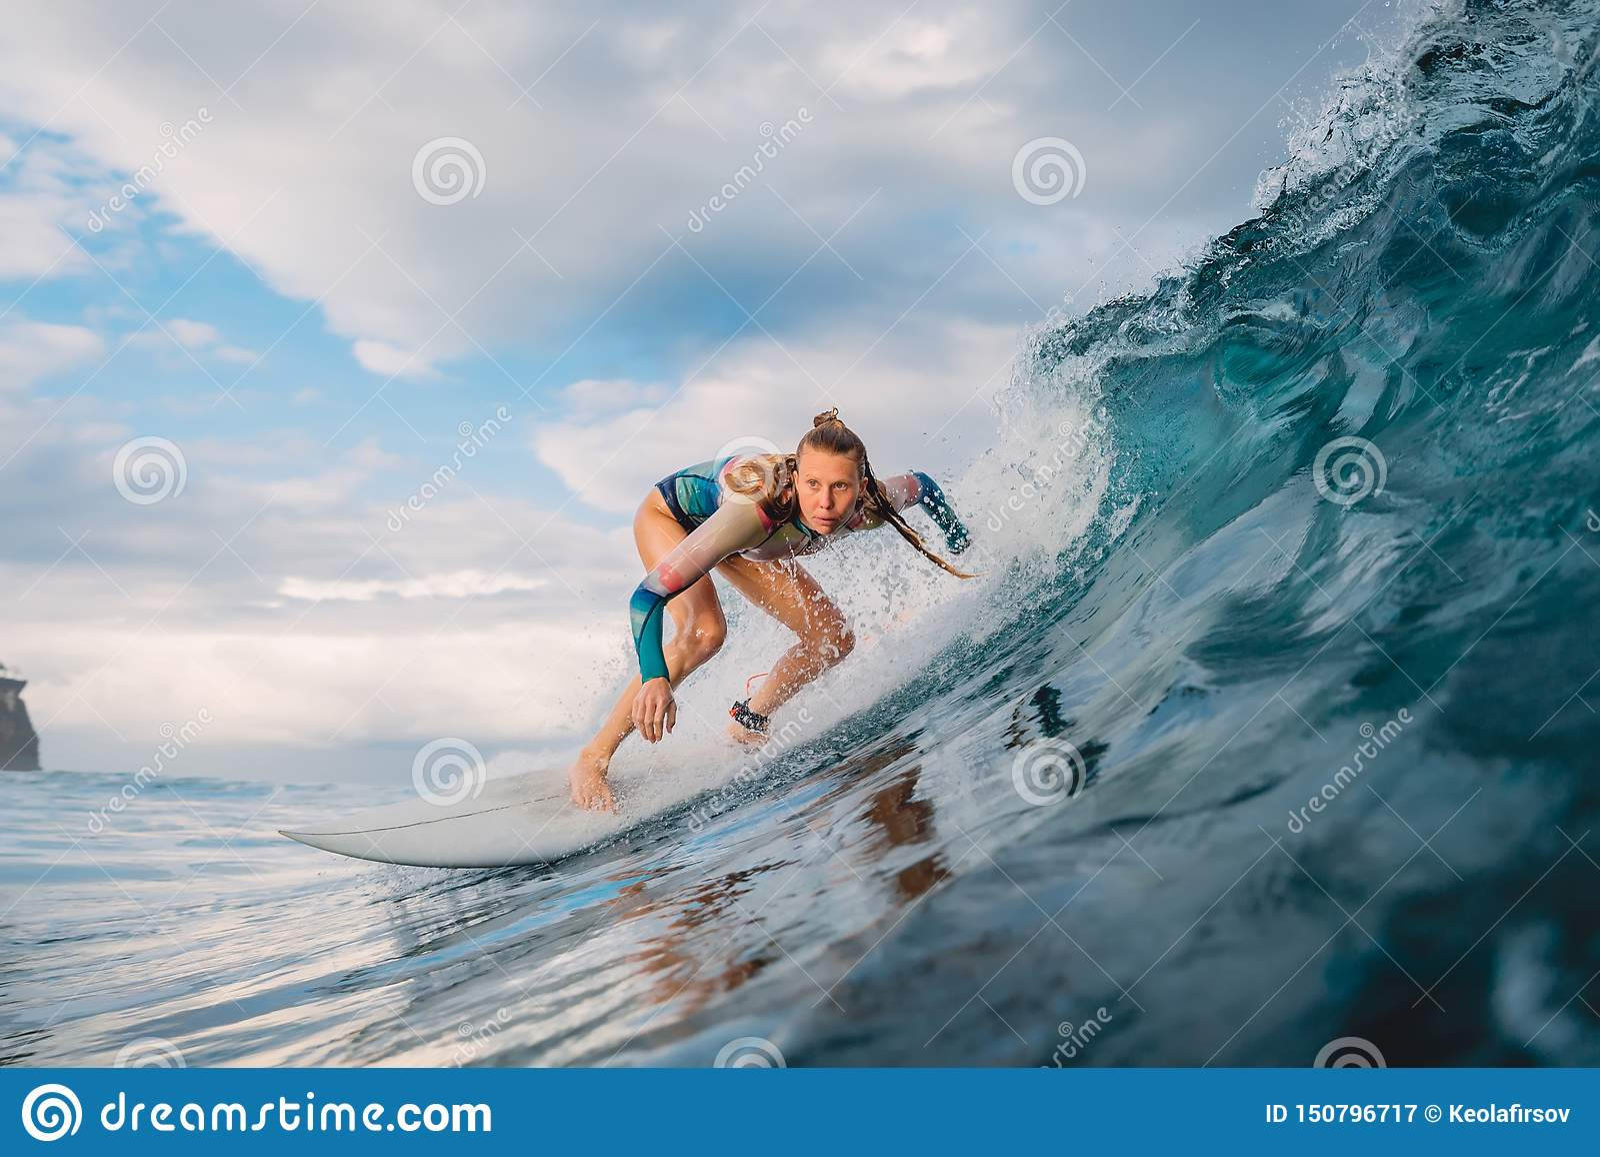 Menina bonita do surfista na prancha Mulher no oceano durante surfar Onda do surfista e do tambor